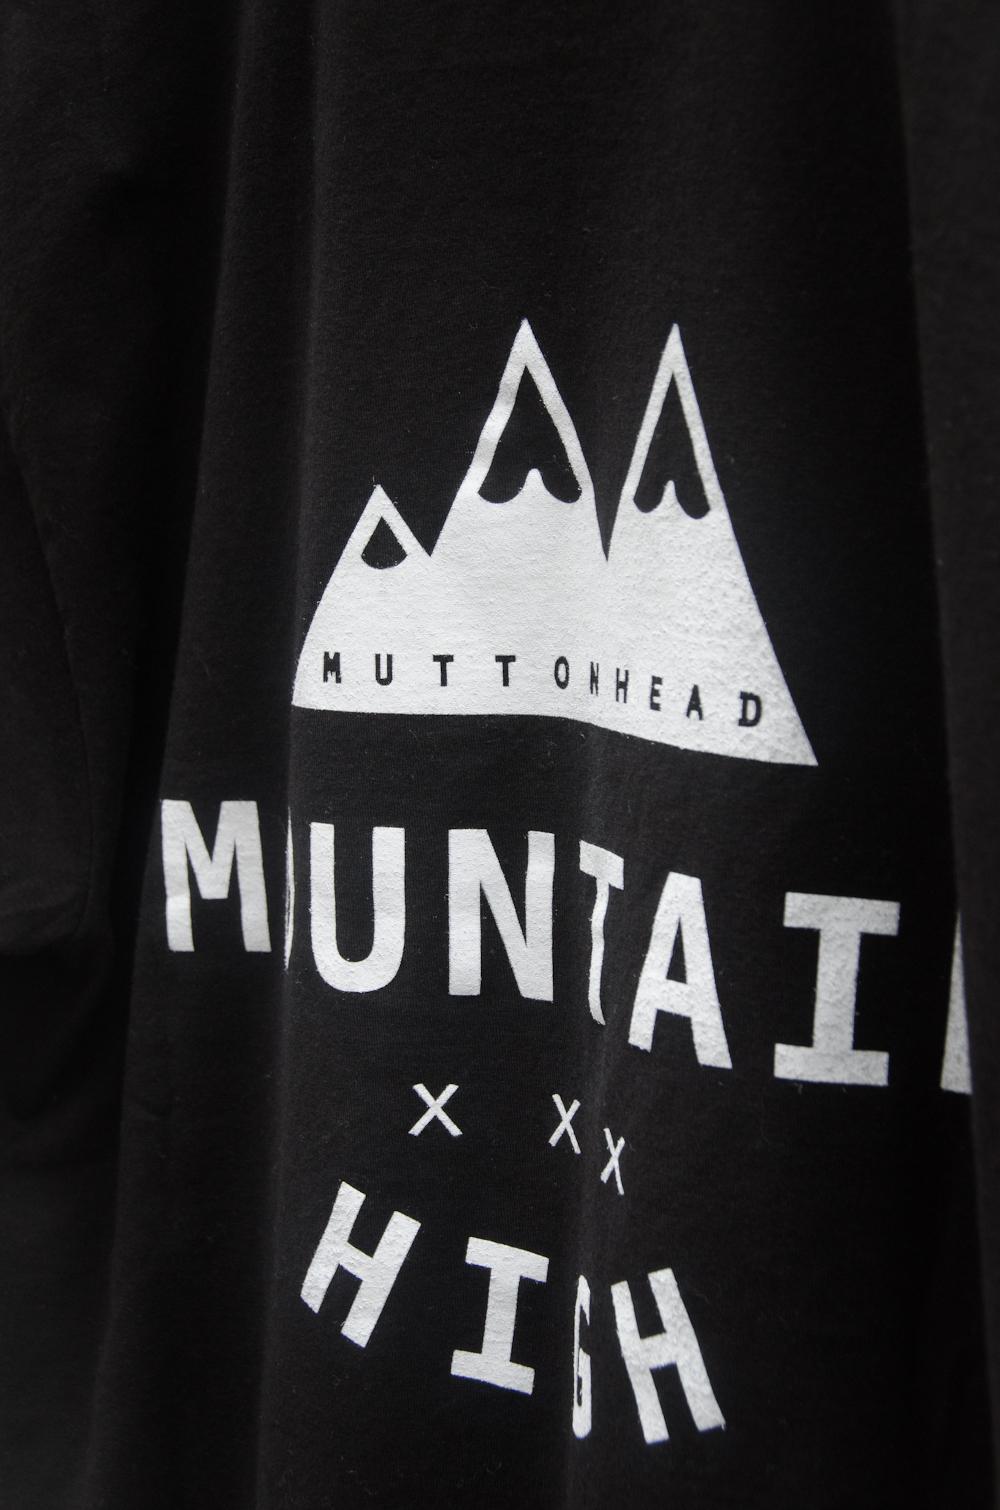 muttonhead-3.jpg